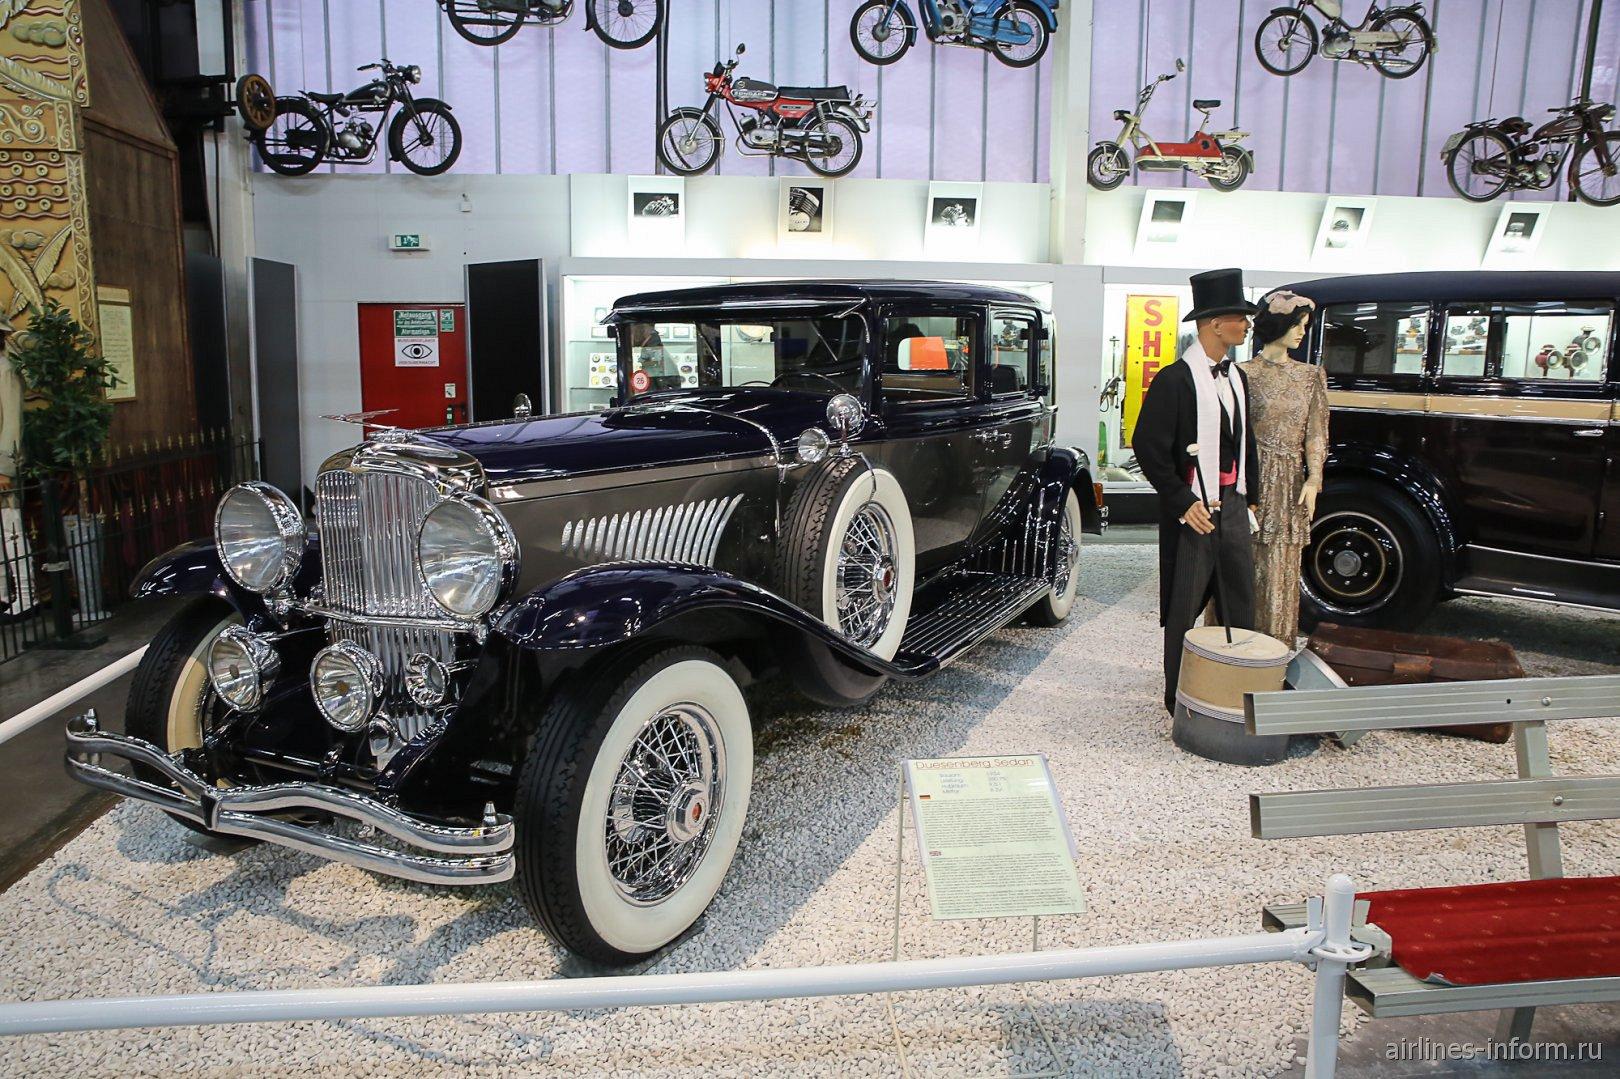 Автомобиль Дюзенберг в музее техники в Зинсхайме